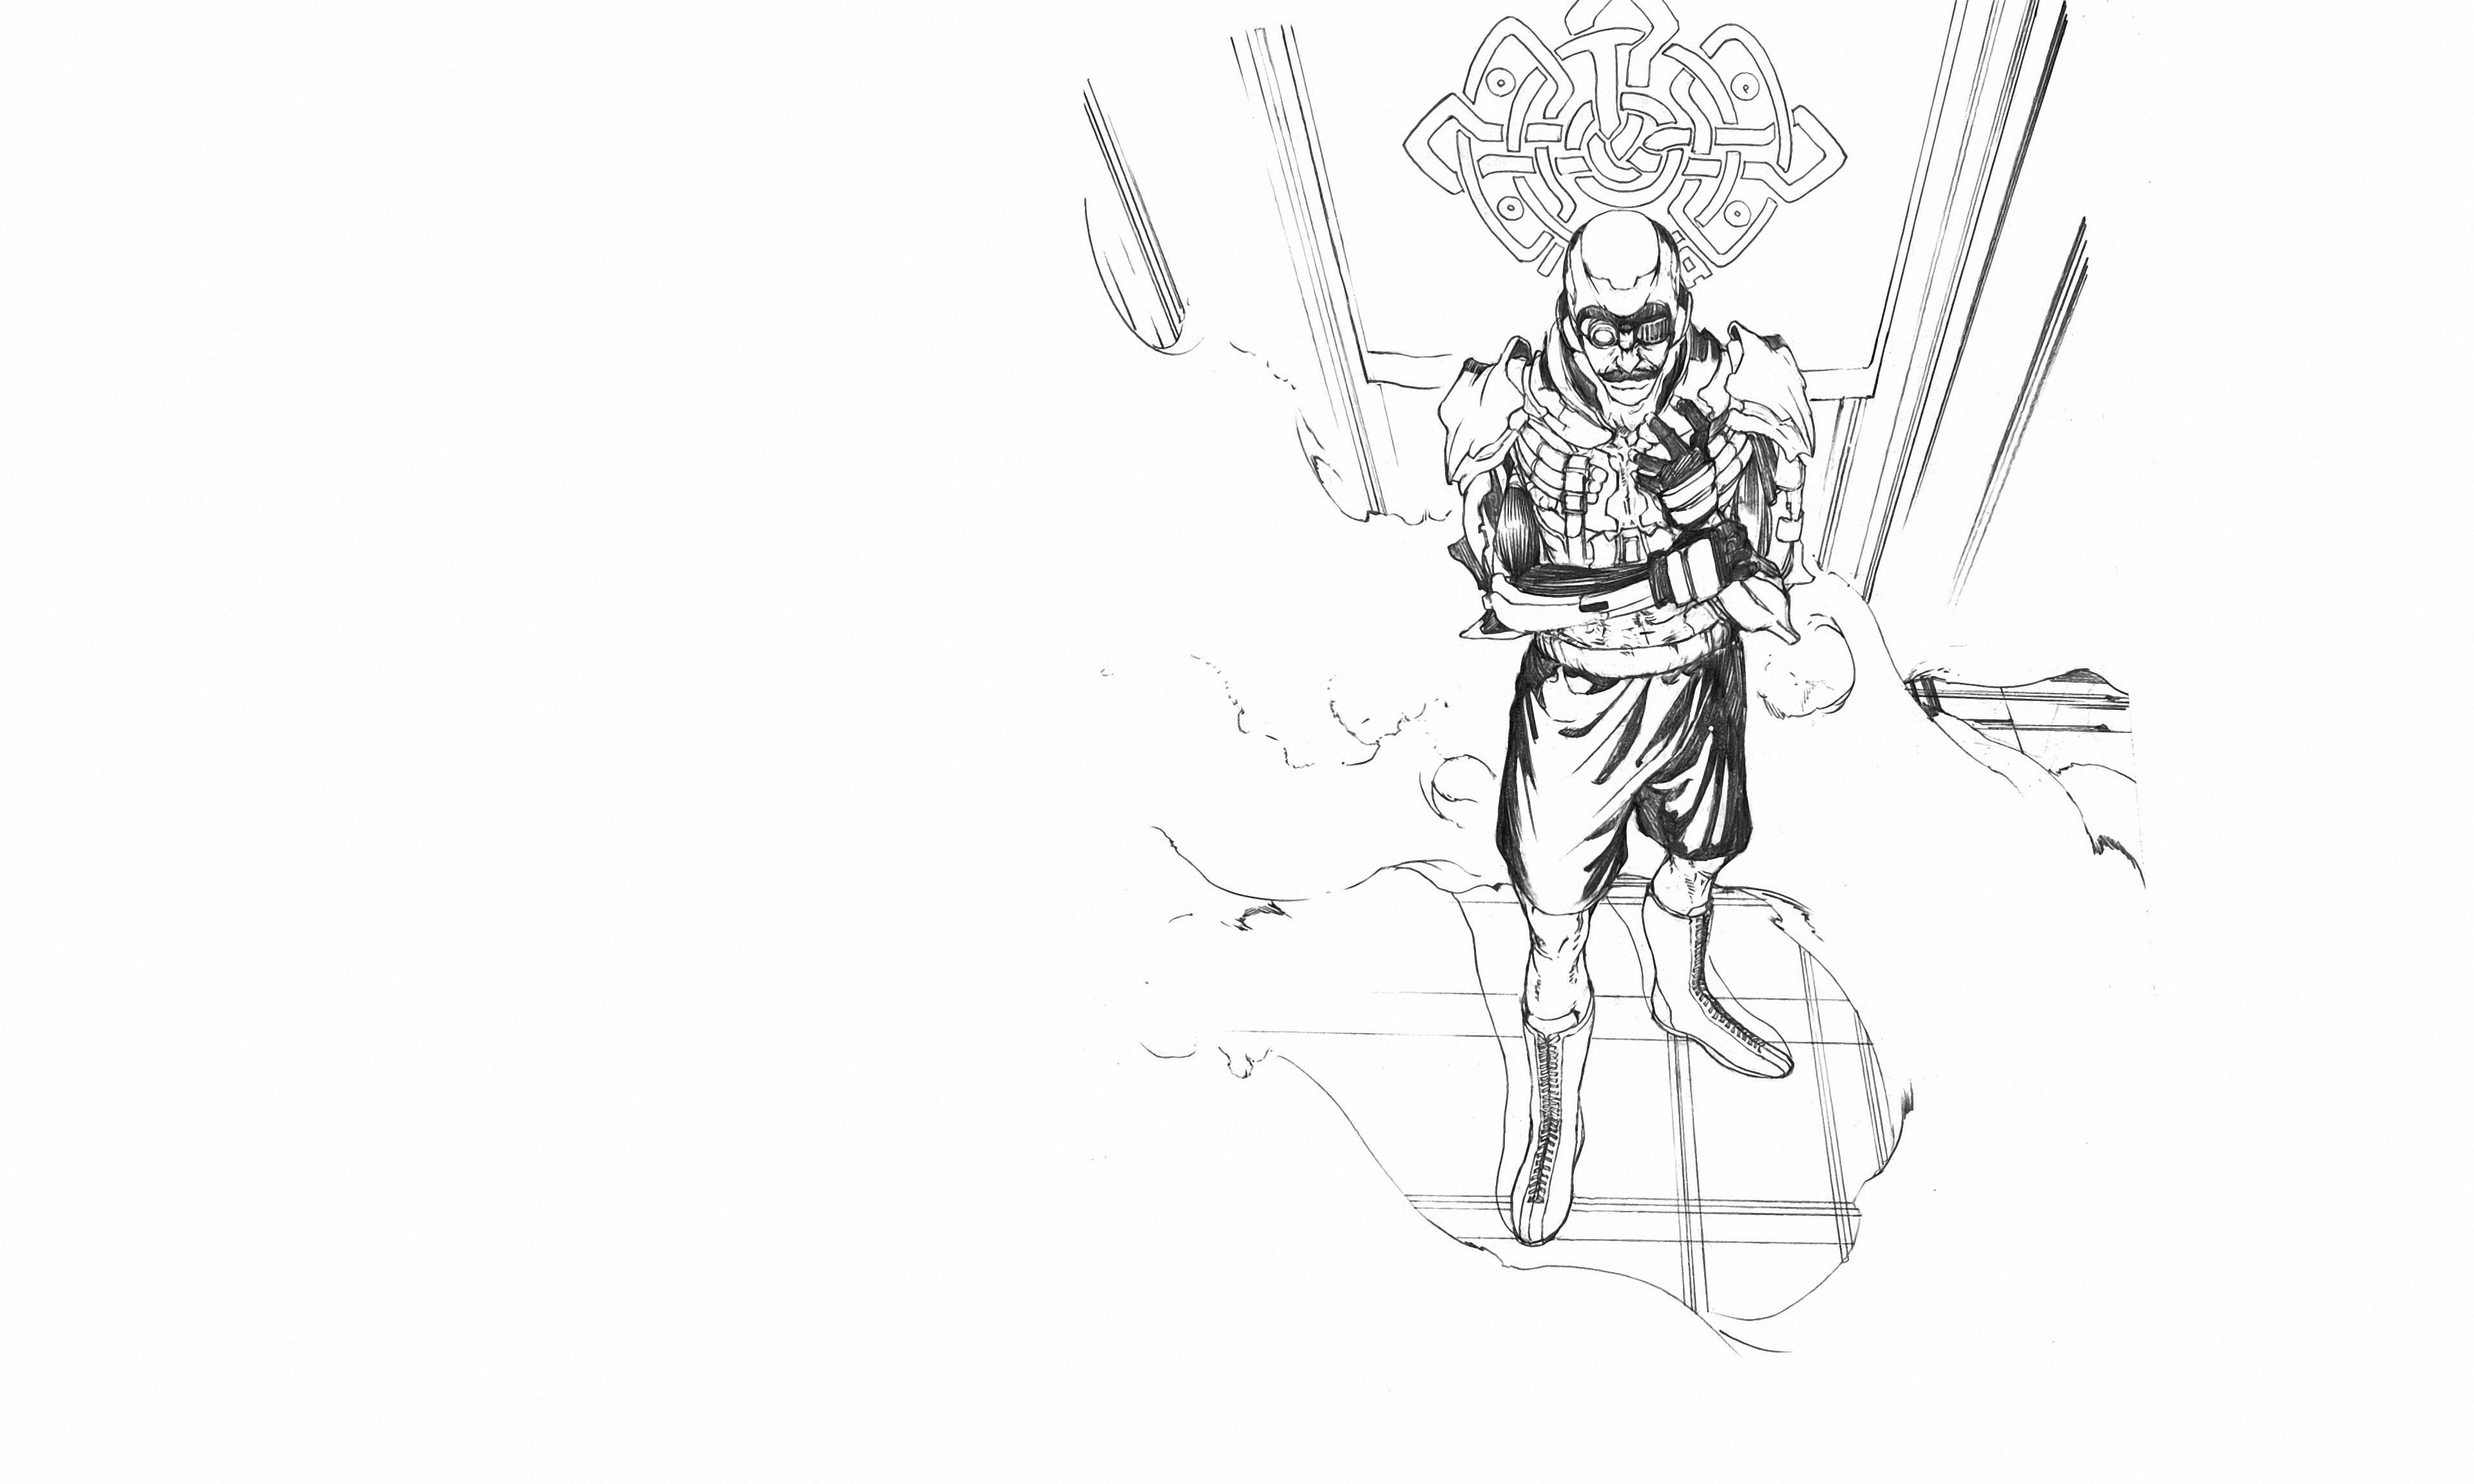 Anime 3840x2304 LEVIUS manga artwork steampunk anime Netflix Netflix TV Series combat